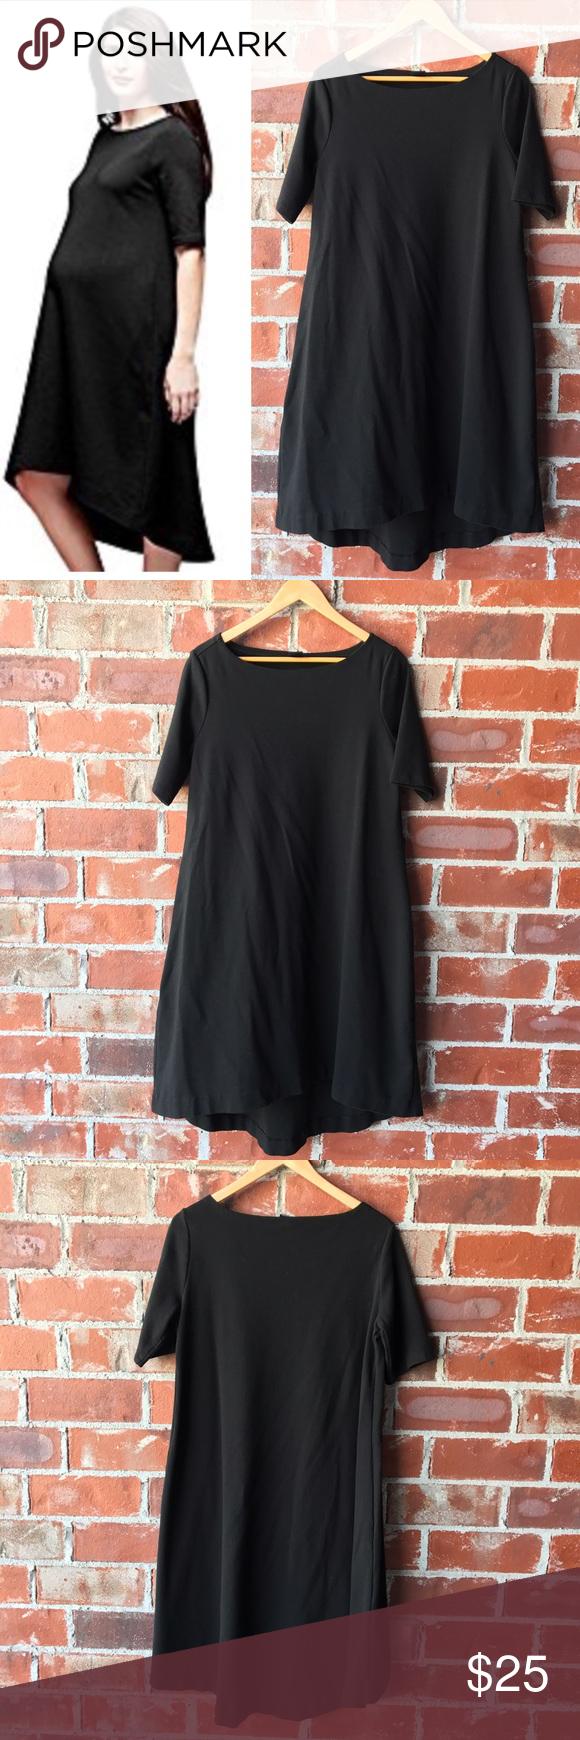 Gap maternity dress swing dress dress black and swings gap maternity dress ombrellifo Image collections